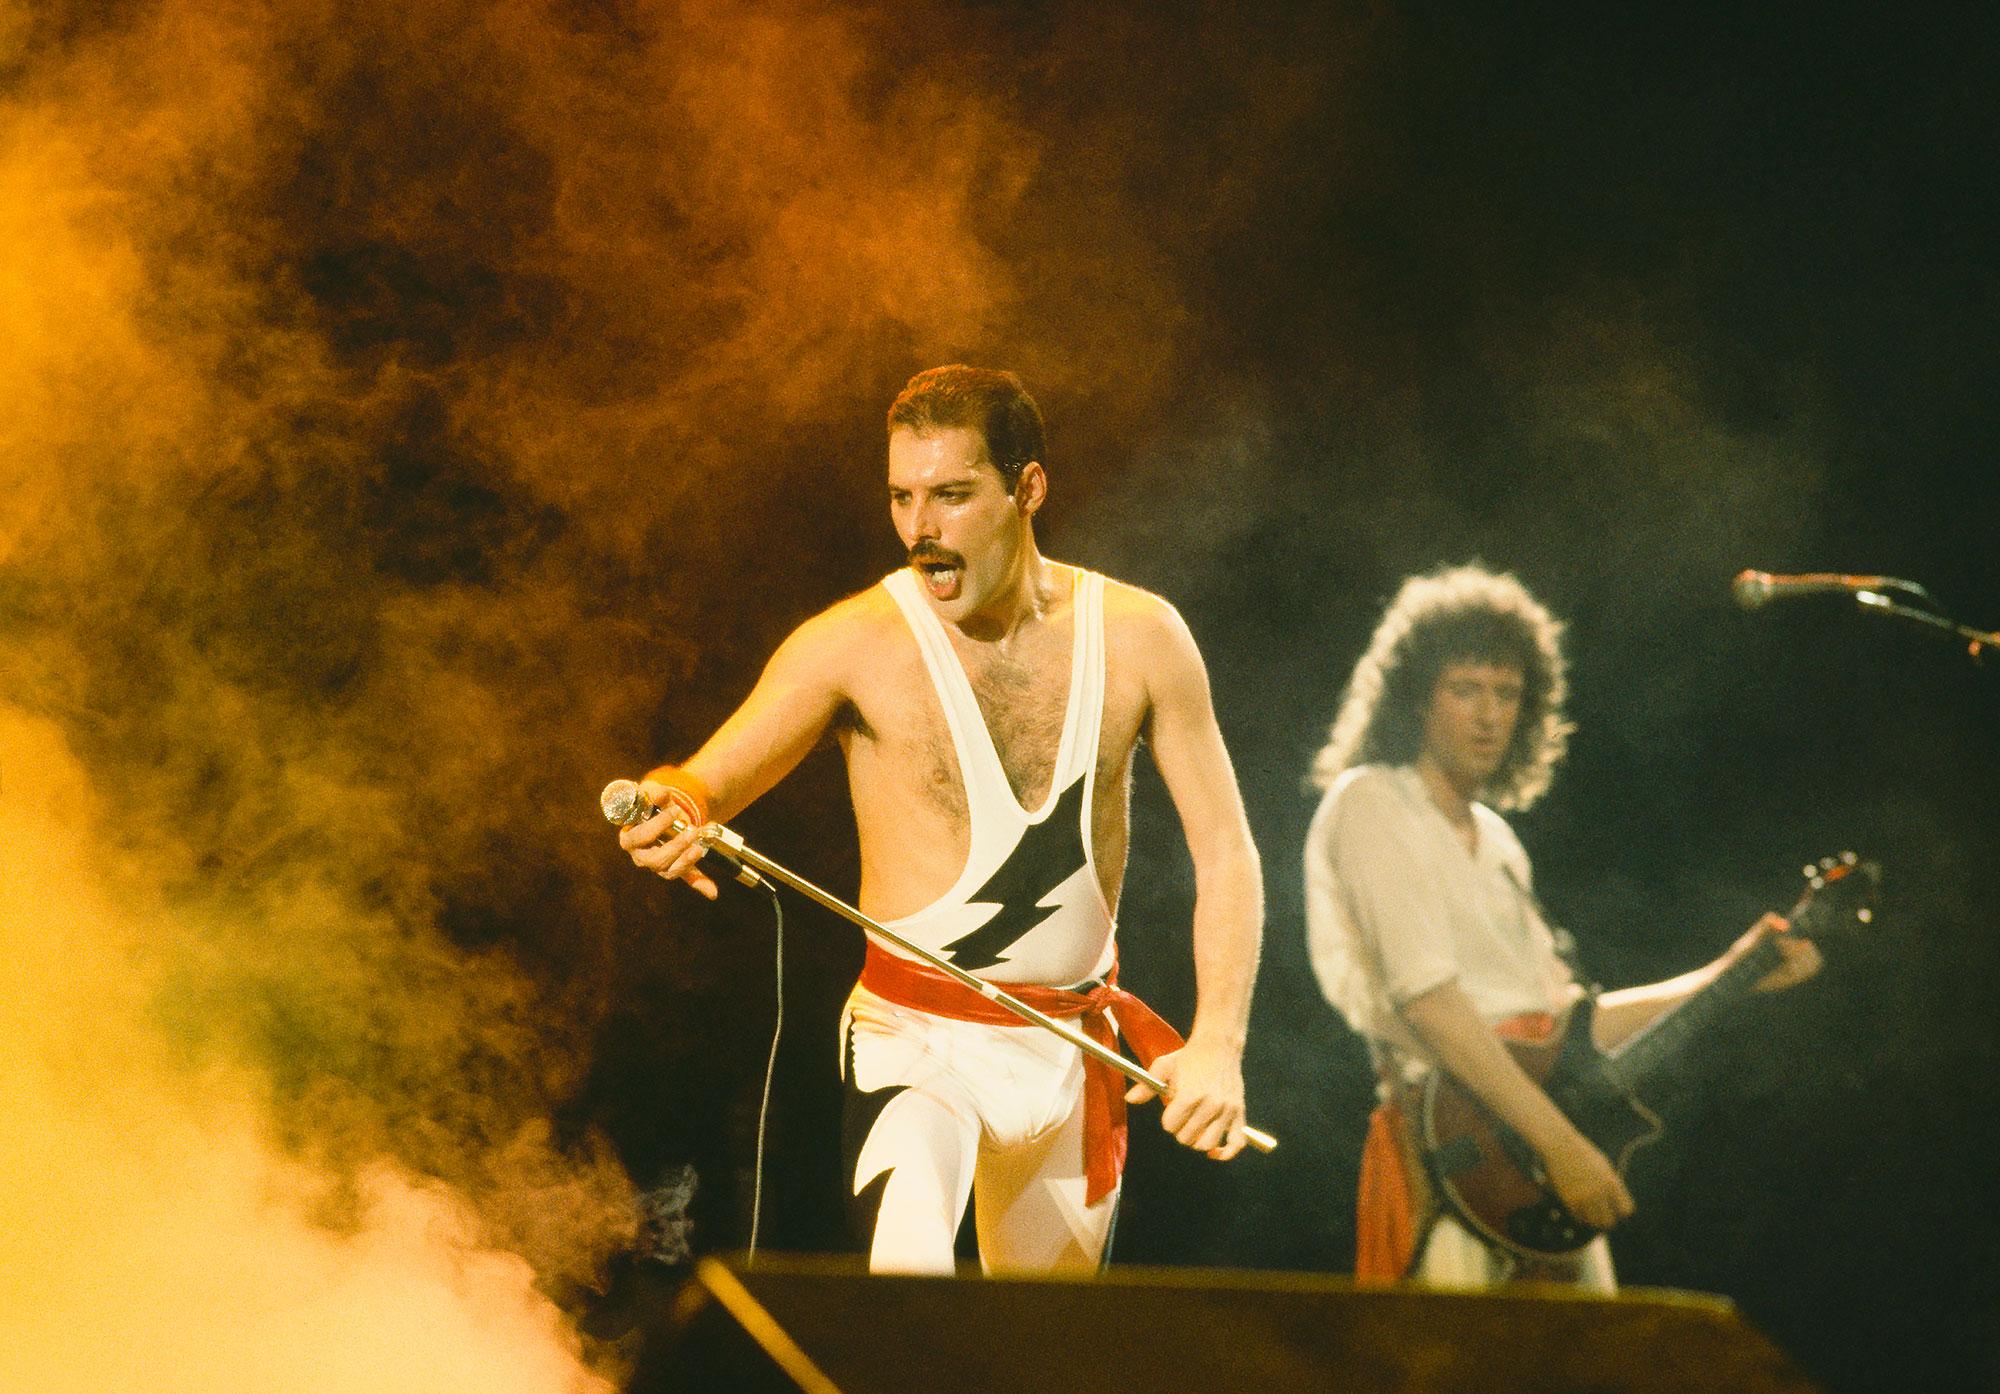 d47a344da27 Queen + Adam Lambert on Honoring Freddie Mercury s Legacy – Rolling Stone